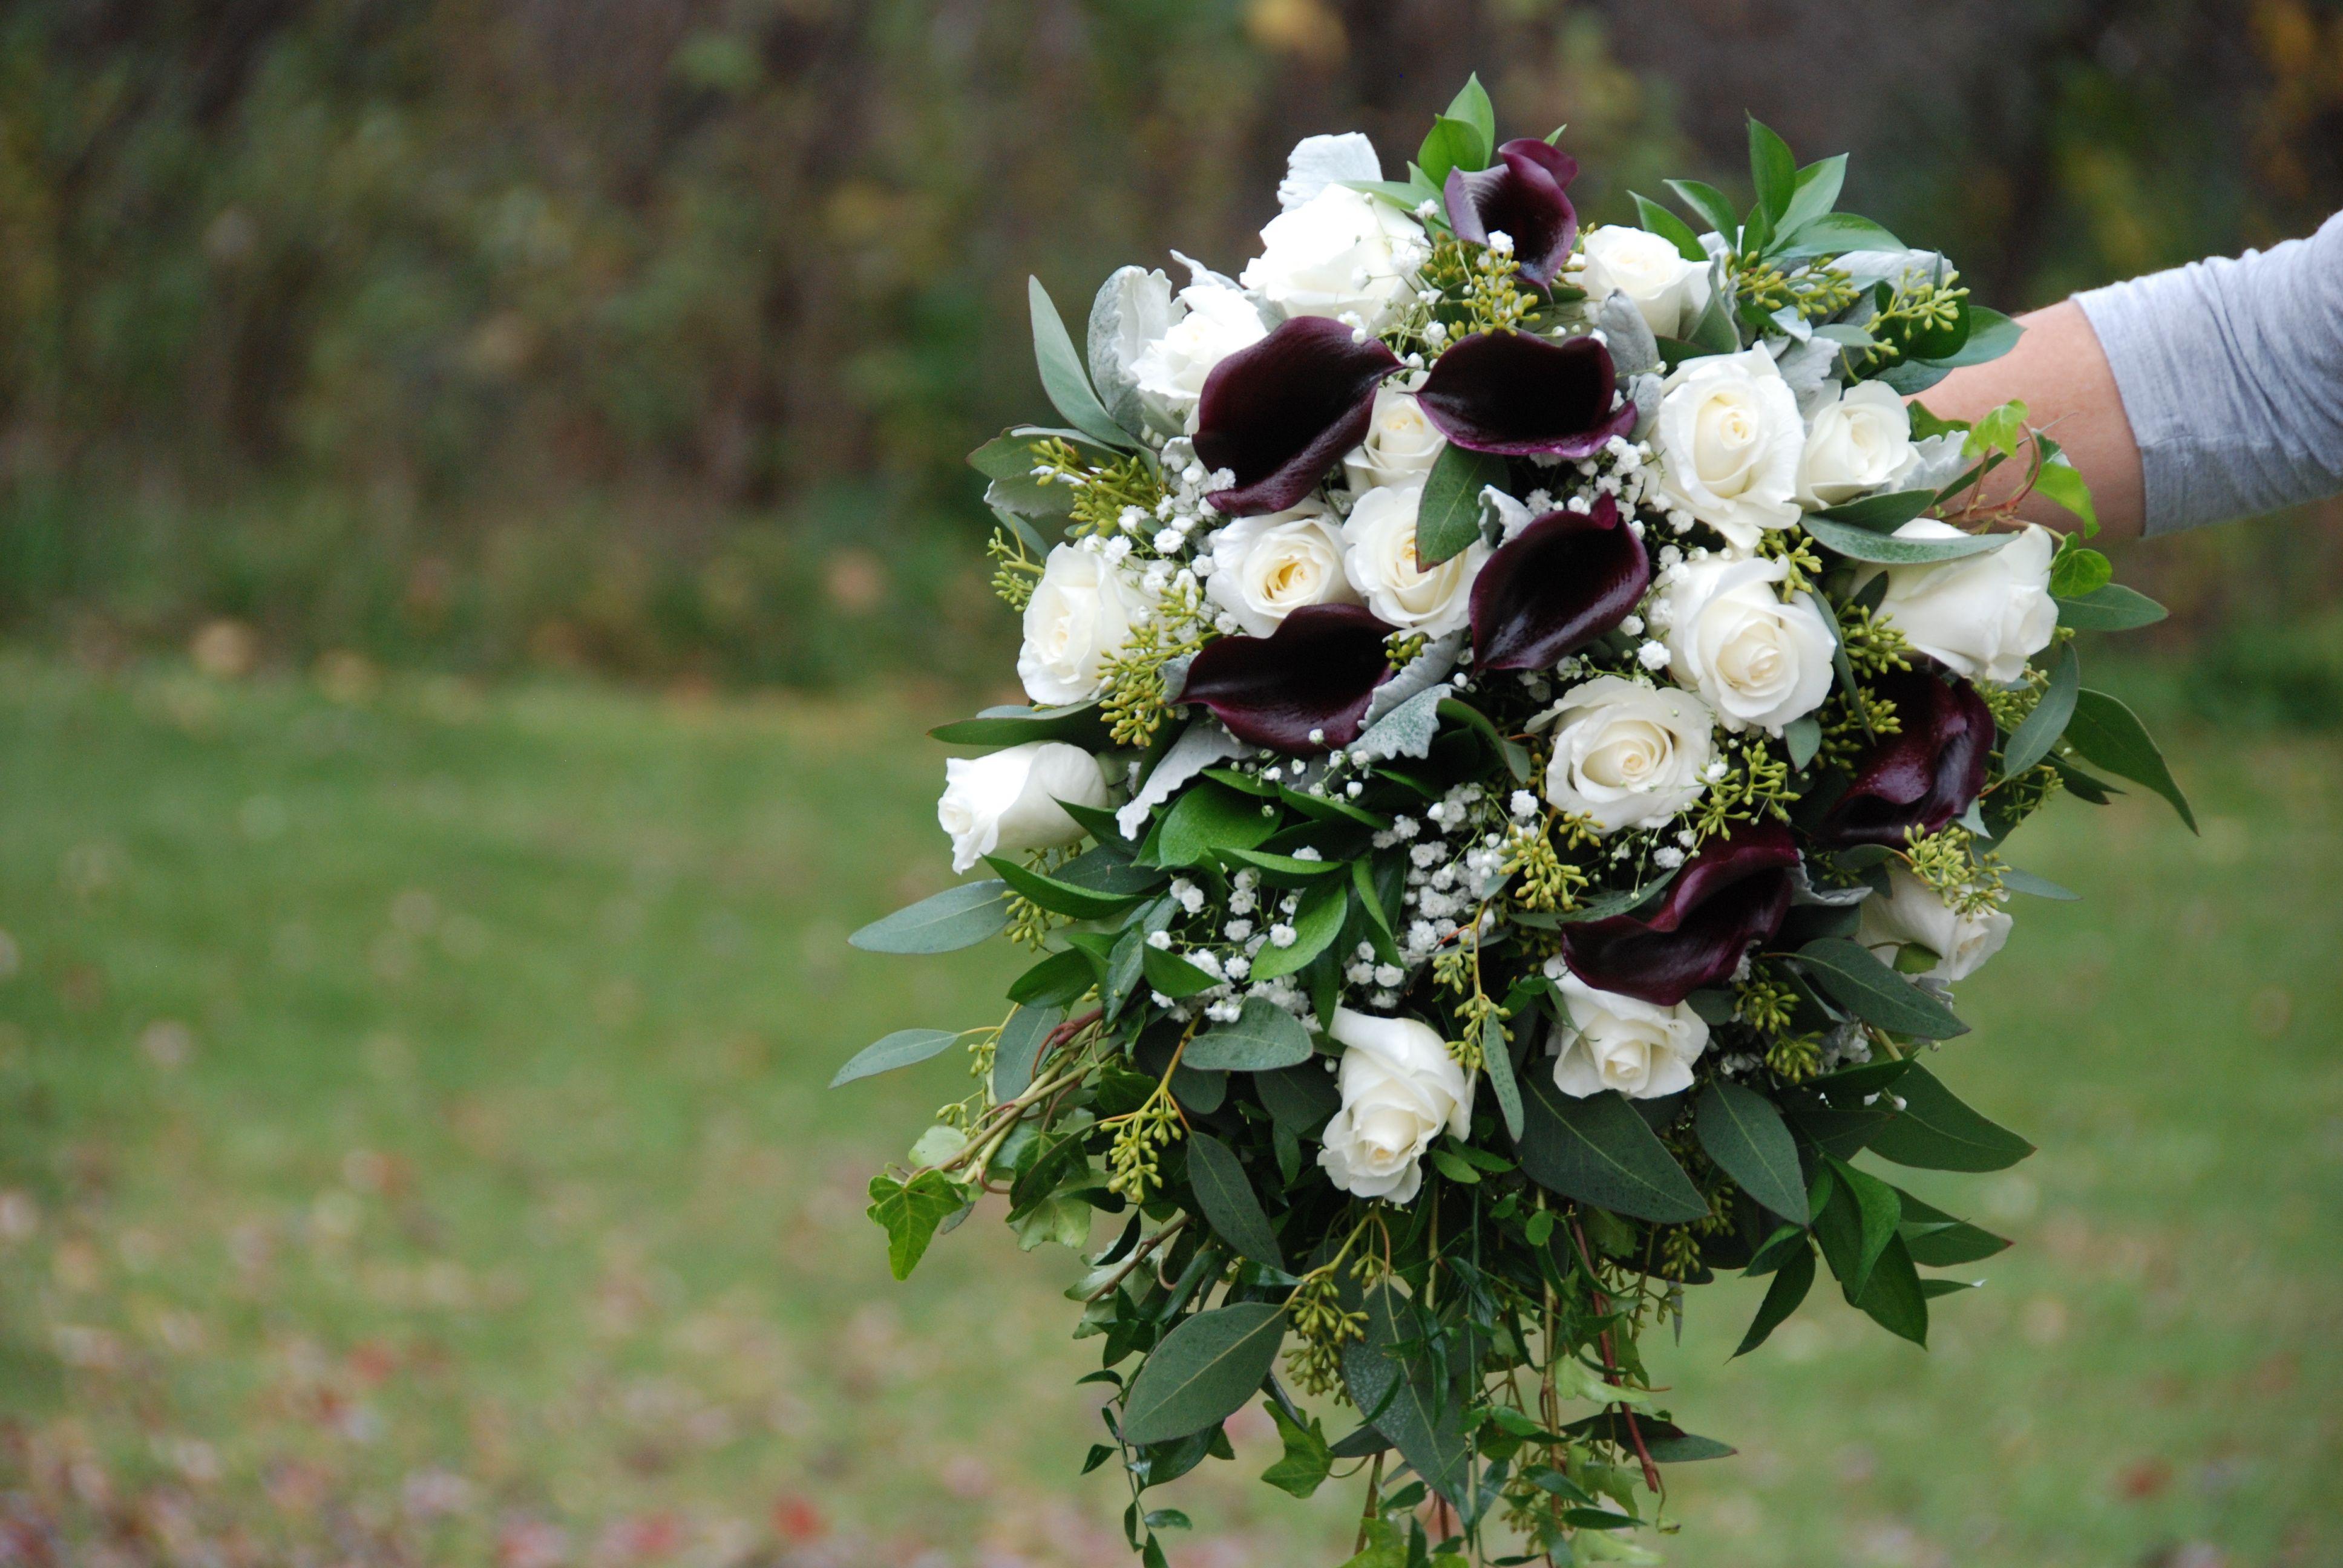 Bridal Bouquet White Roses Purple Calla Lilies Ivy Seeded Eucalyptus Italian